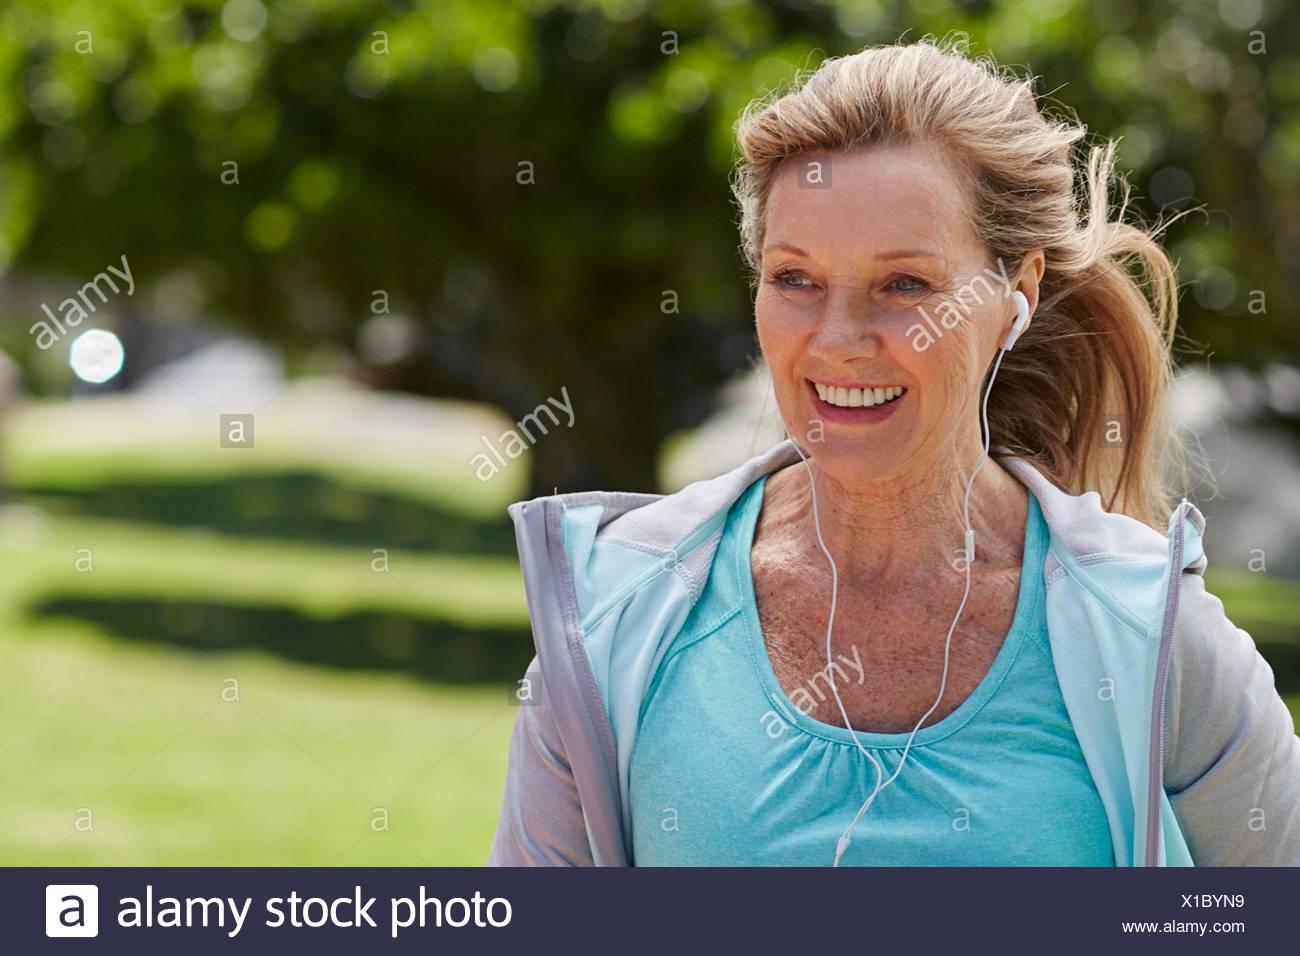 MODEL RELEASED. Senior woman exercising wearing earphones. - Stock Image